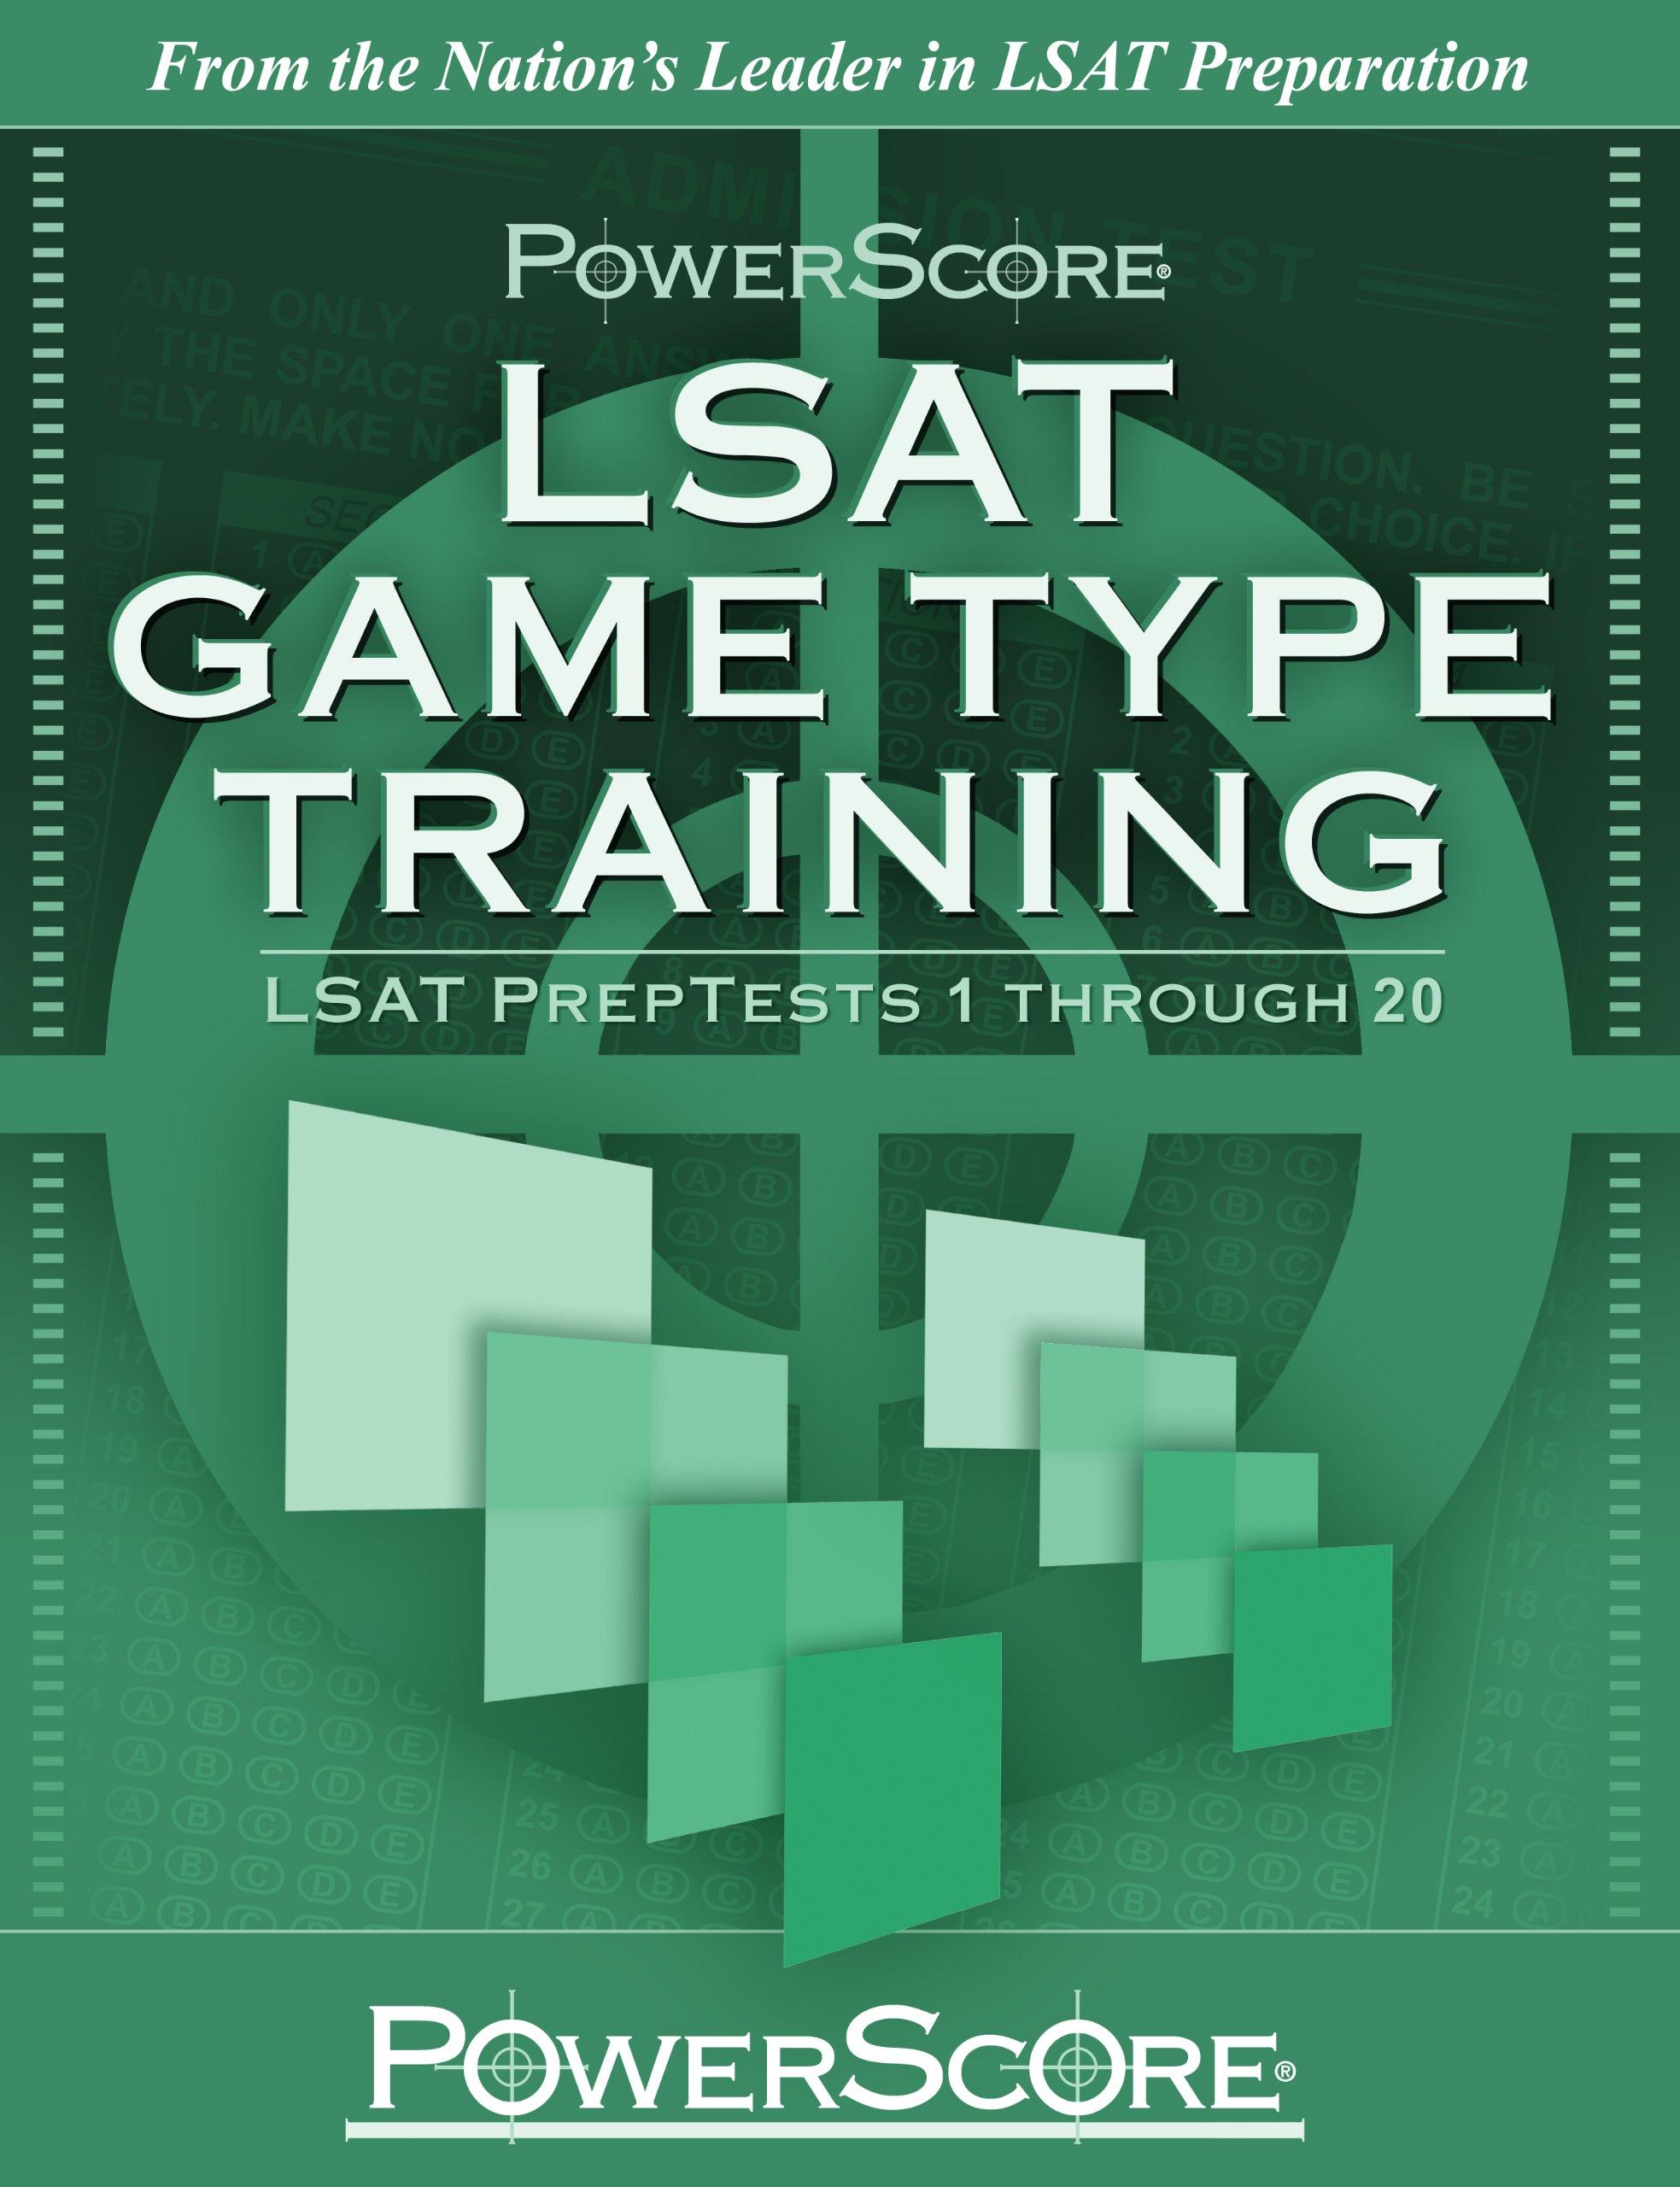 Buy LSAT Game Type Training: LSAT Preptests 1 Through 20 (Powerscore Test  Preparation) Book Online at Low Prices in India | LSAT Game Type Training:  LSAT ...